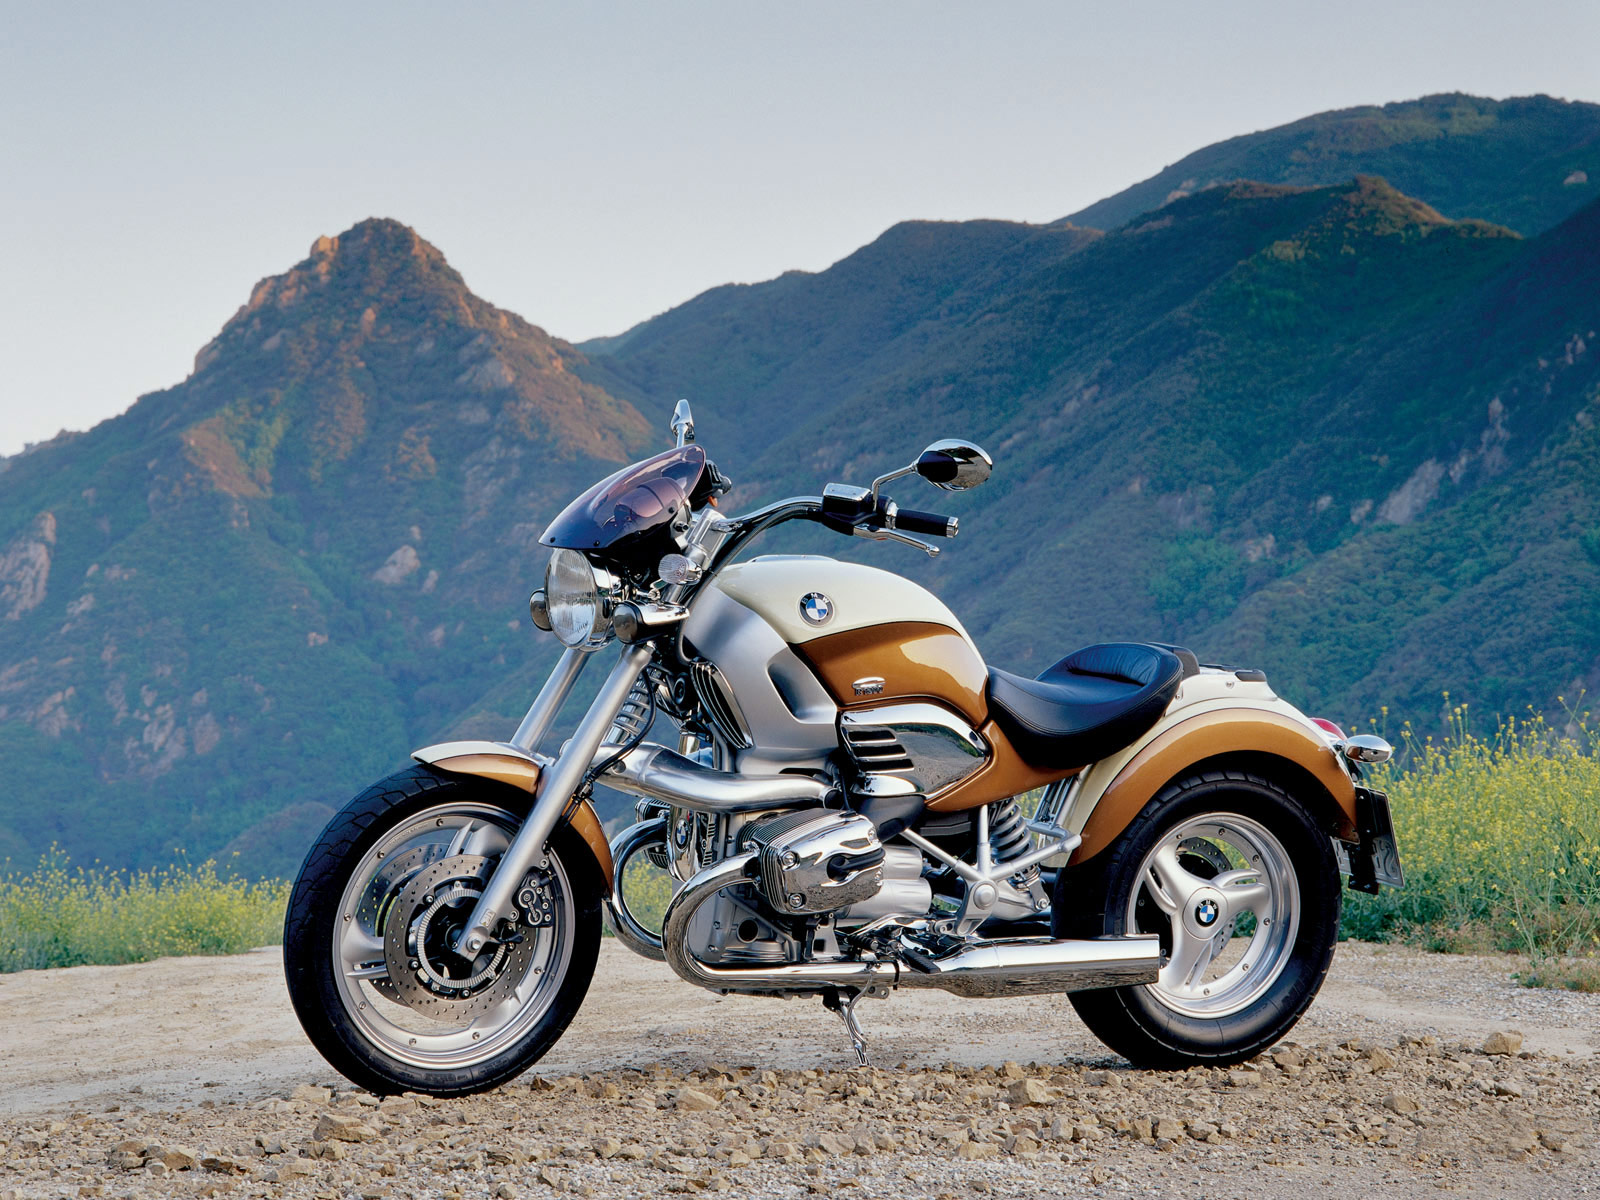 BMW Motorcycle R1200C Independence Desktop Wallpapers 2000 2jpg